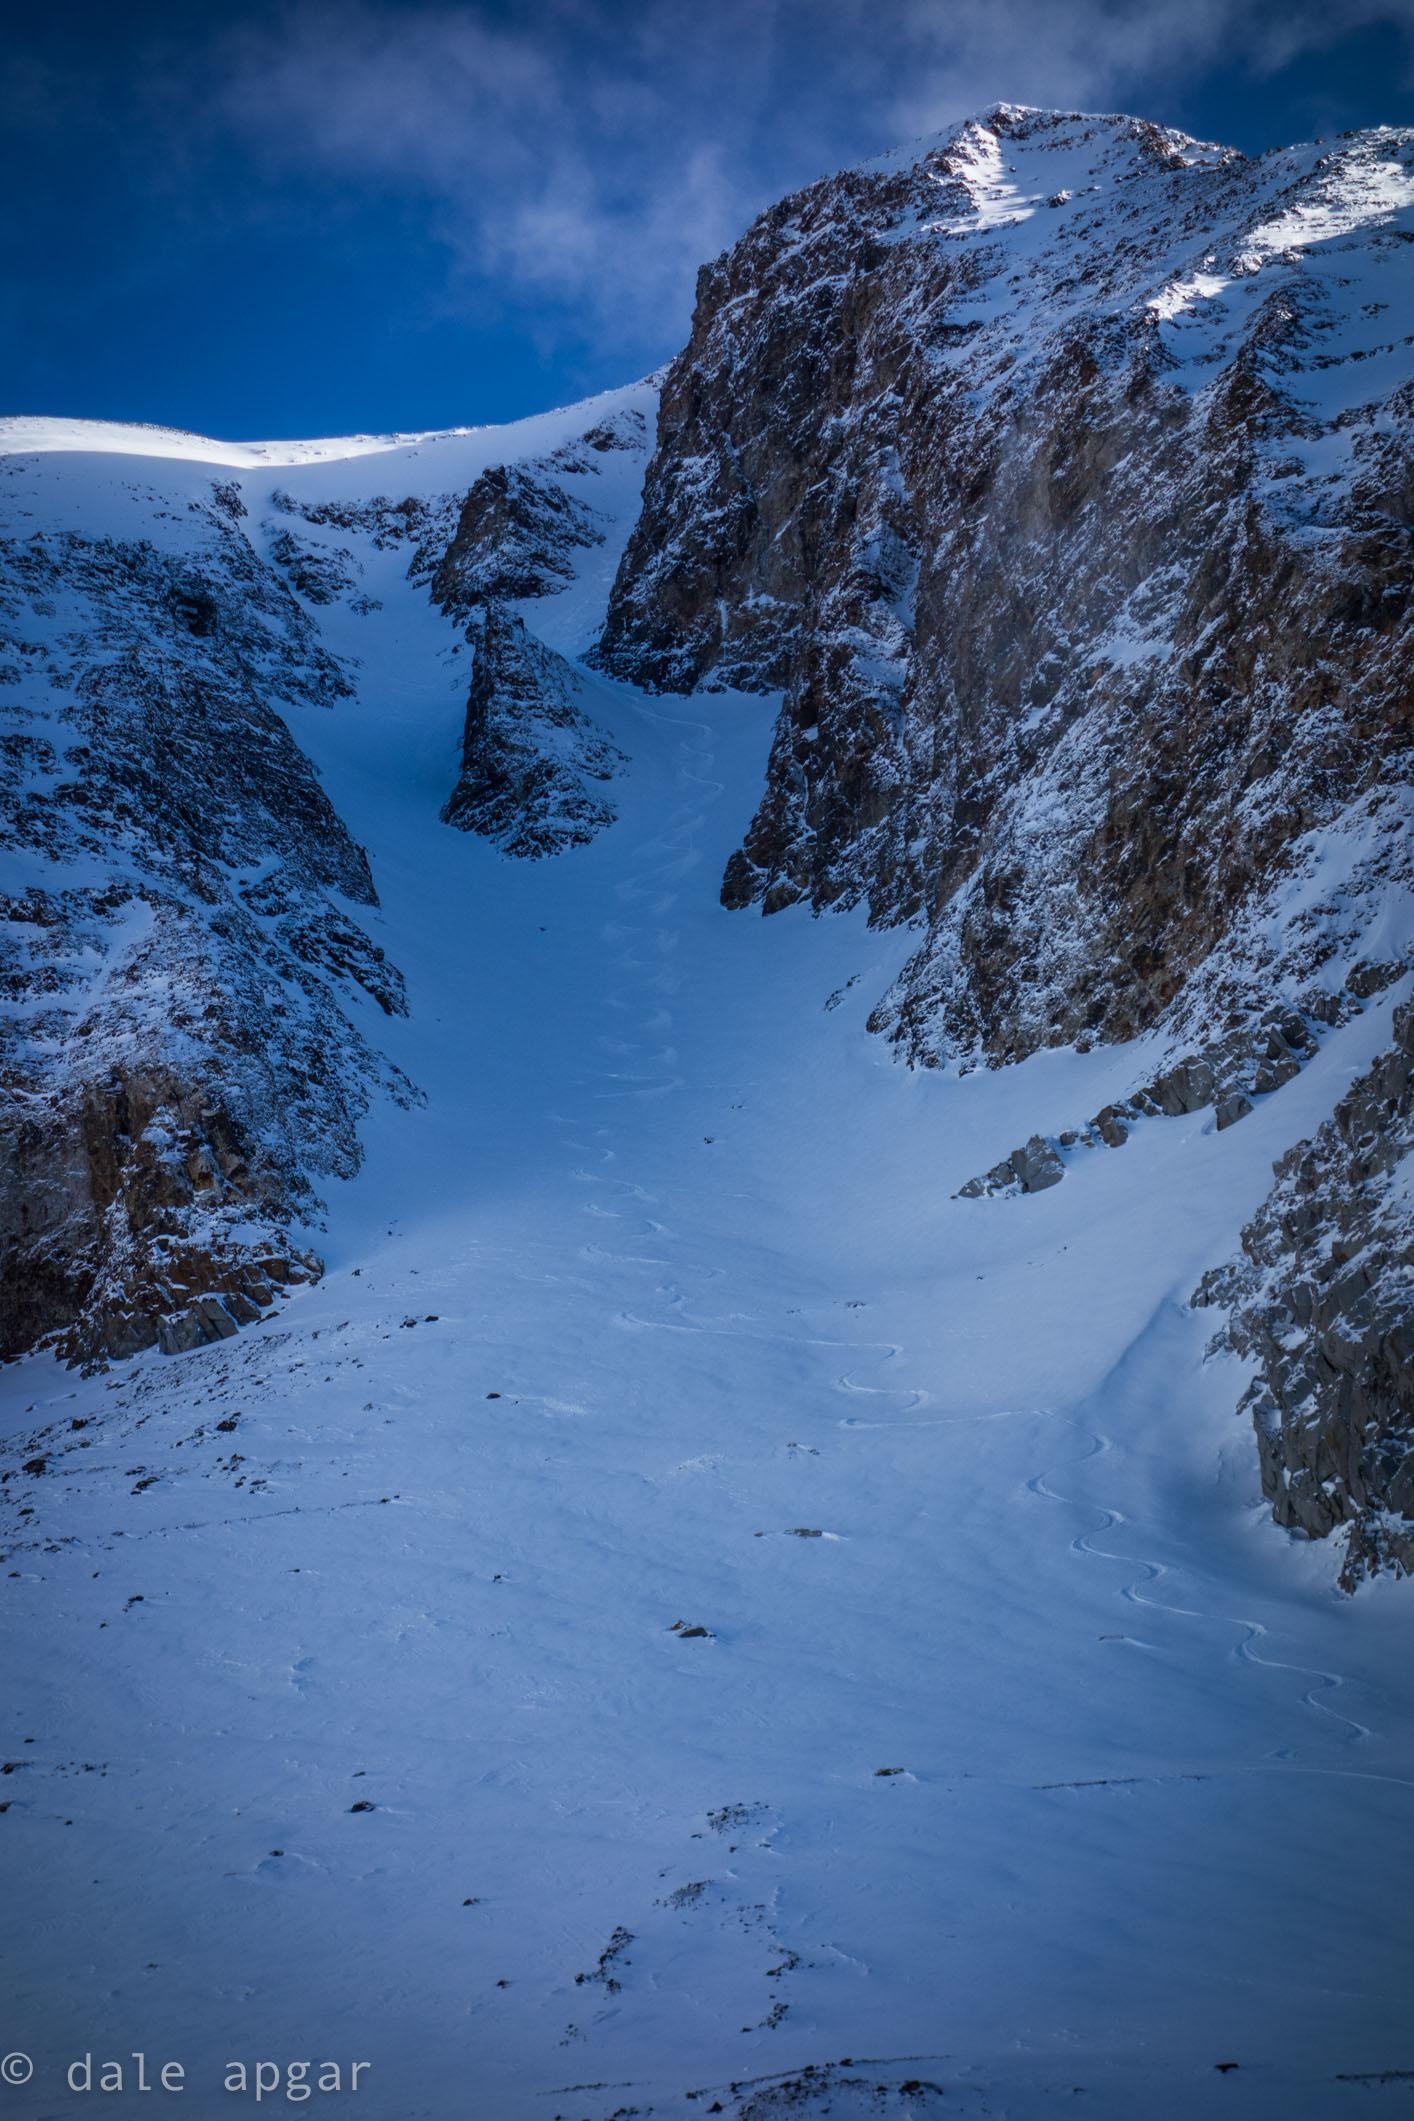 dale_apgar_ski-49.jpg